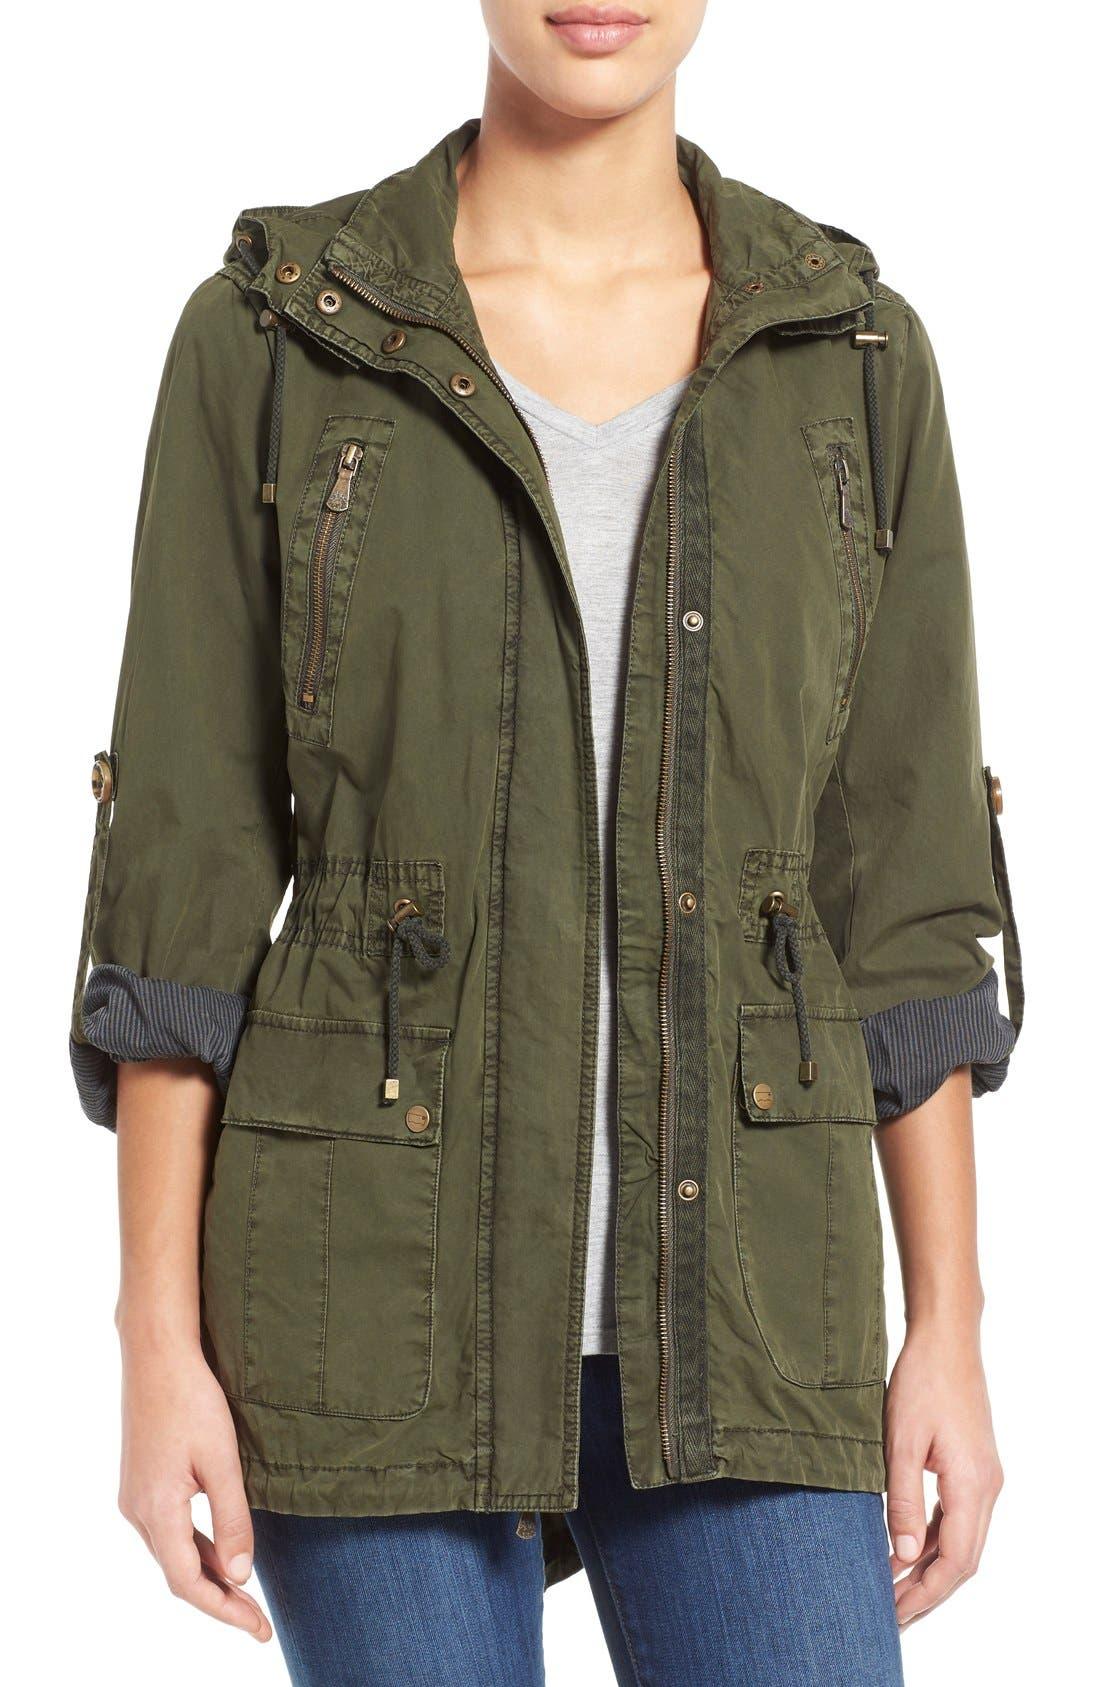 Nike jacket army - Nike Jacket Army 30